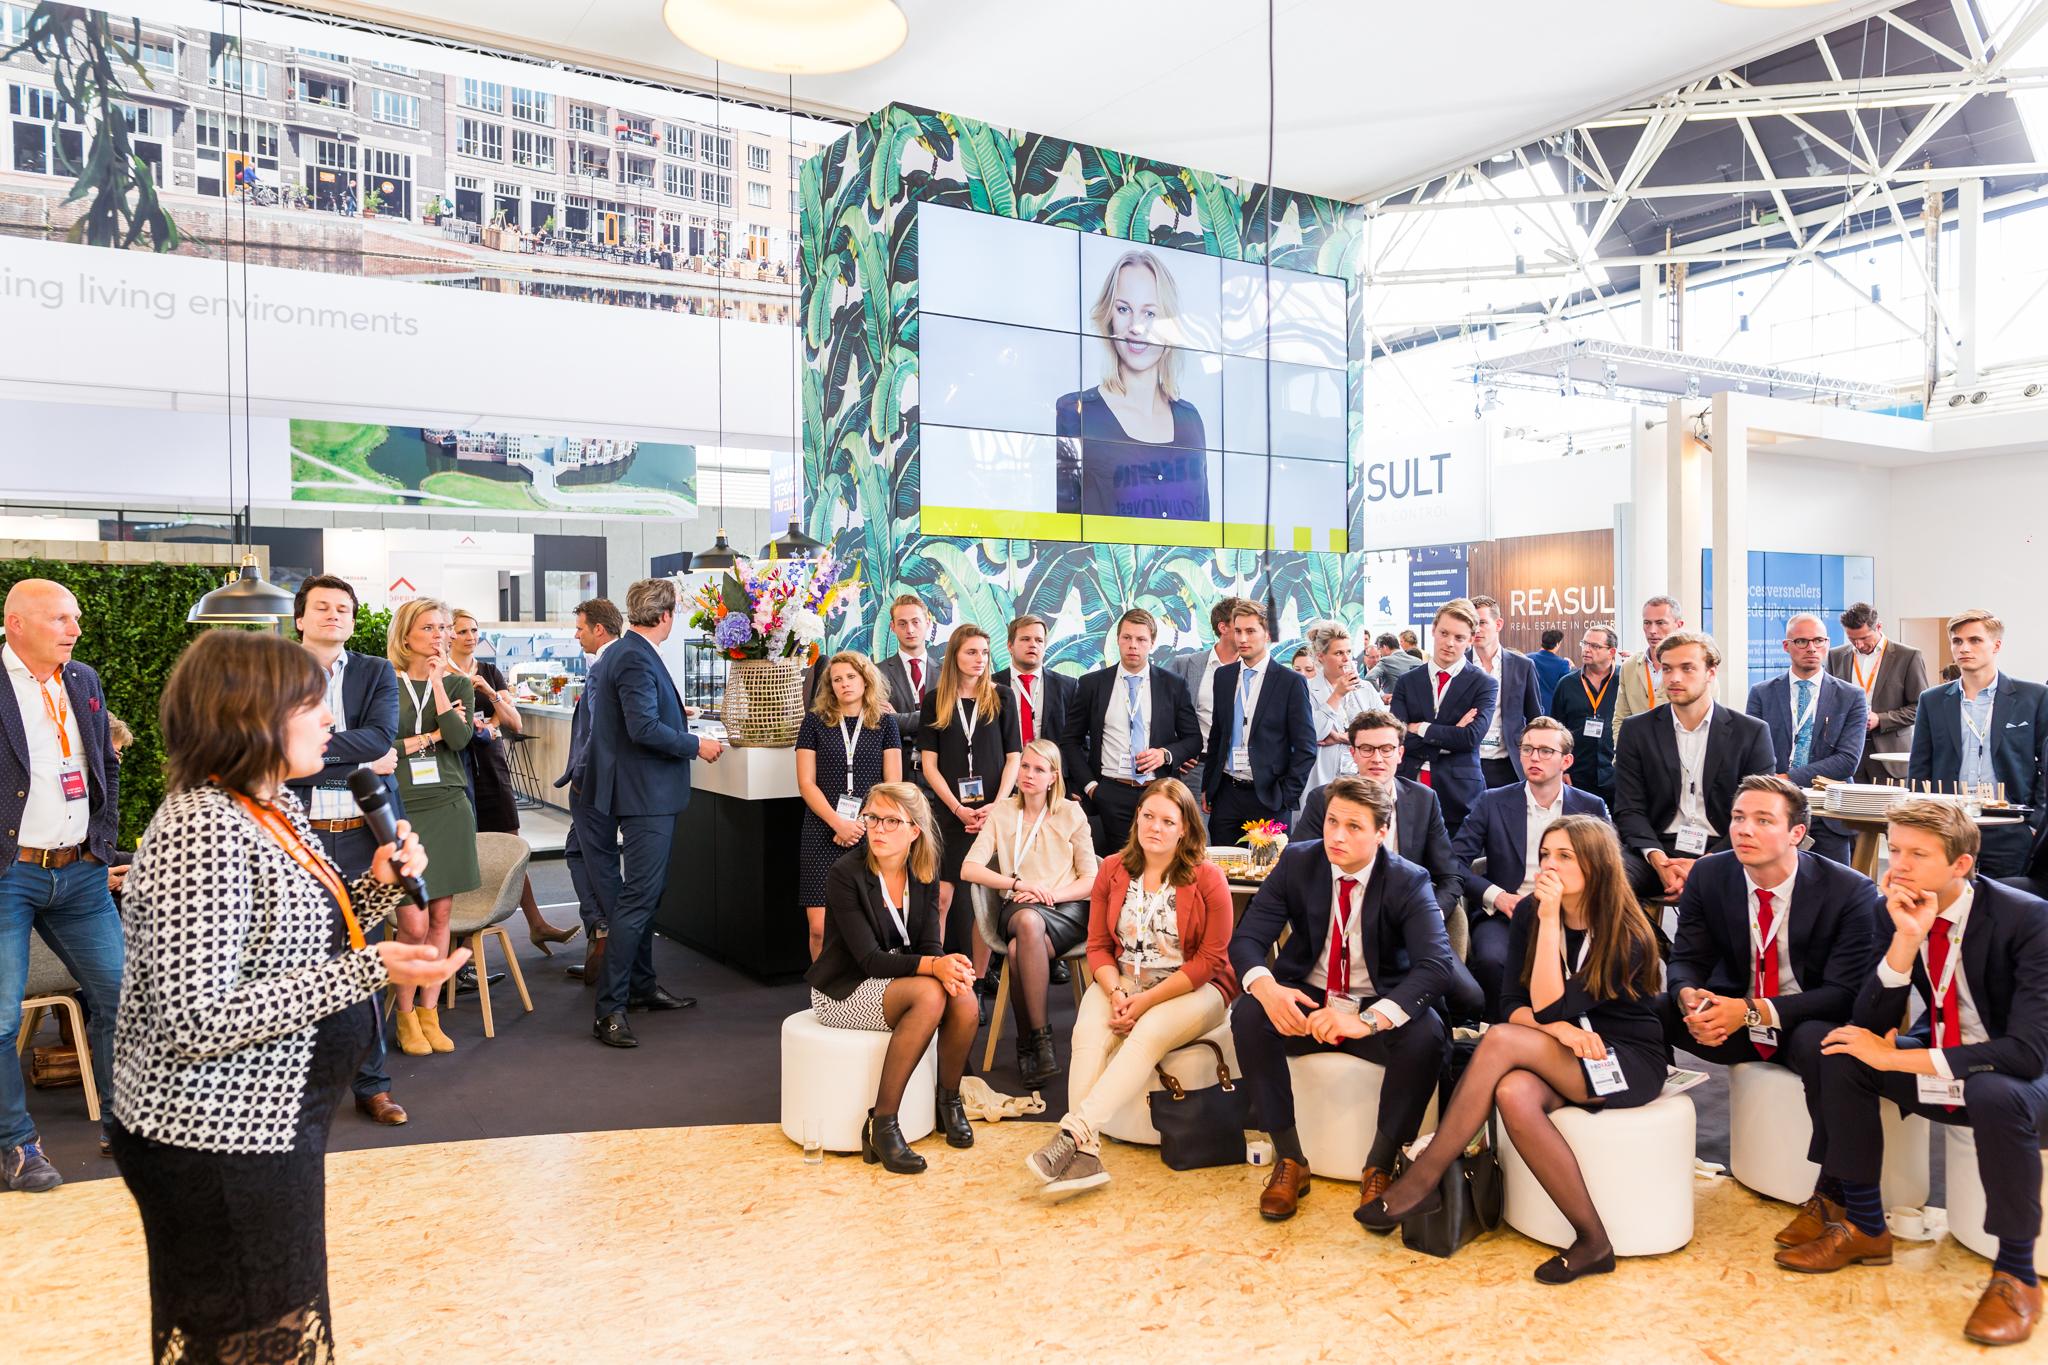 HEYDAY en Amvest presenteren service- en community conceptop PROVADA 2019